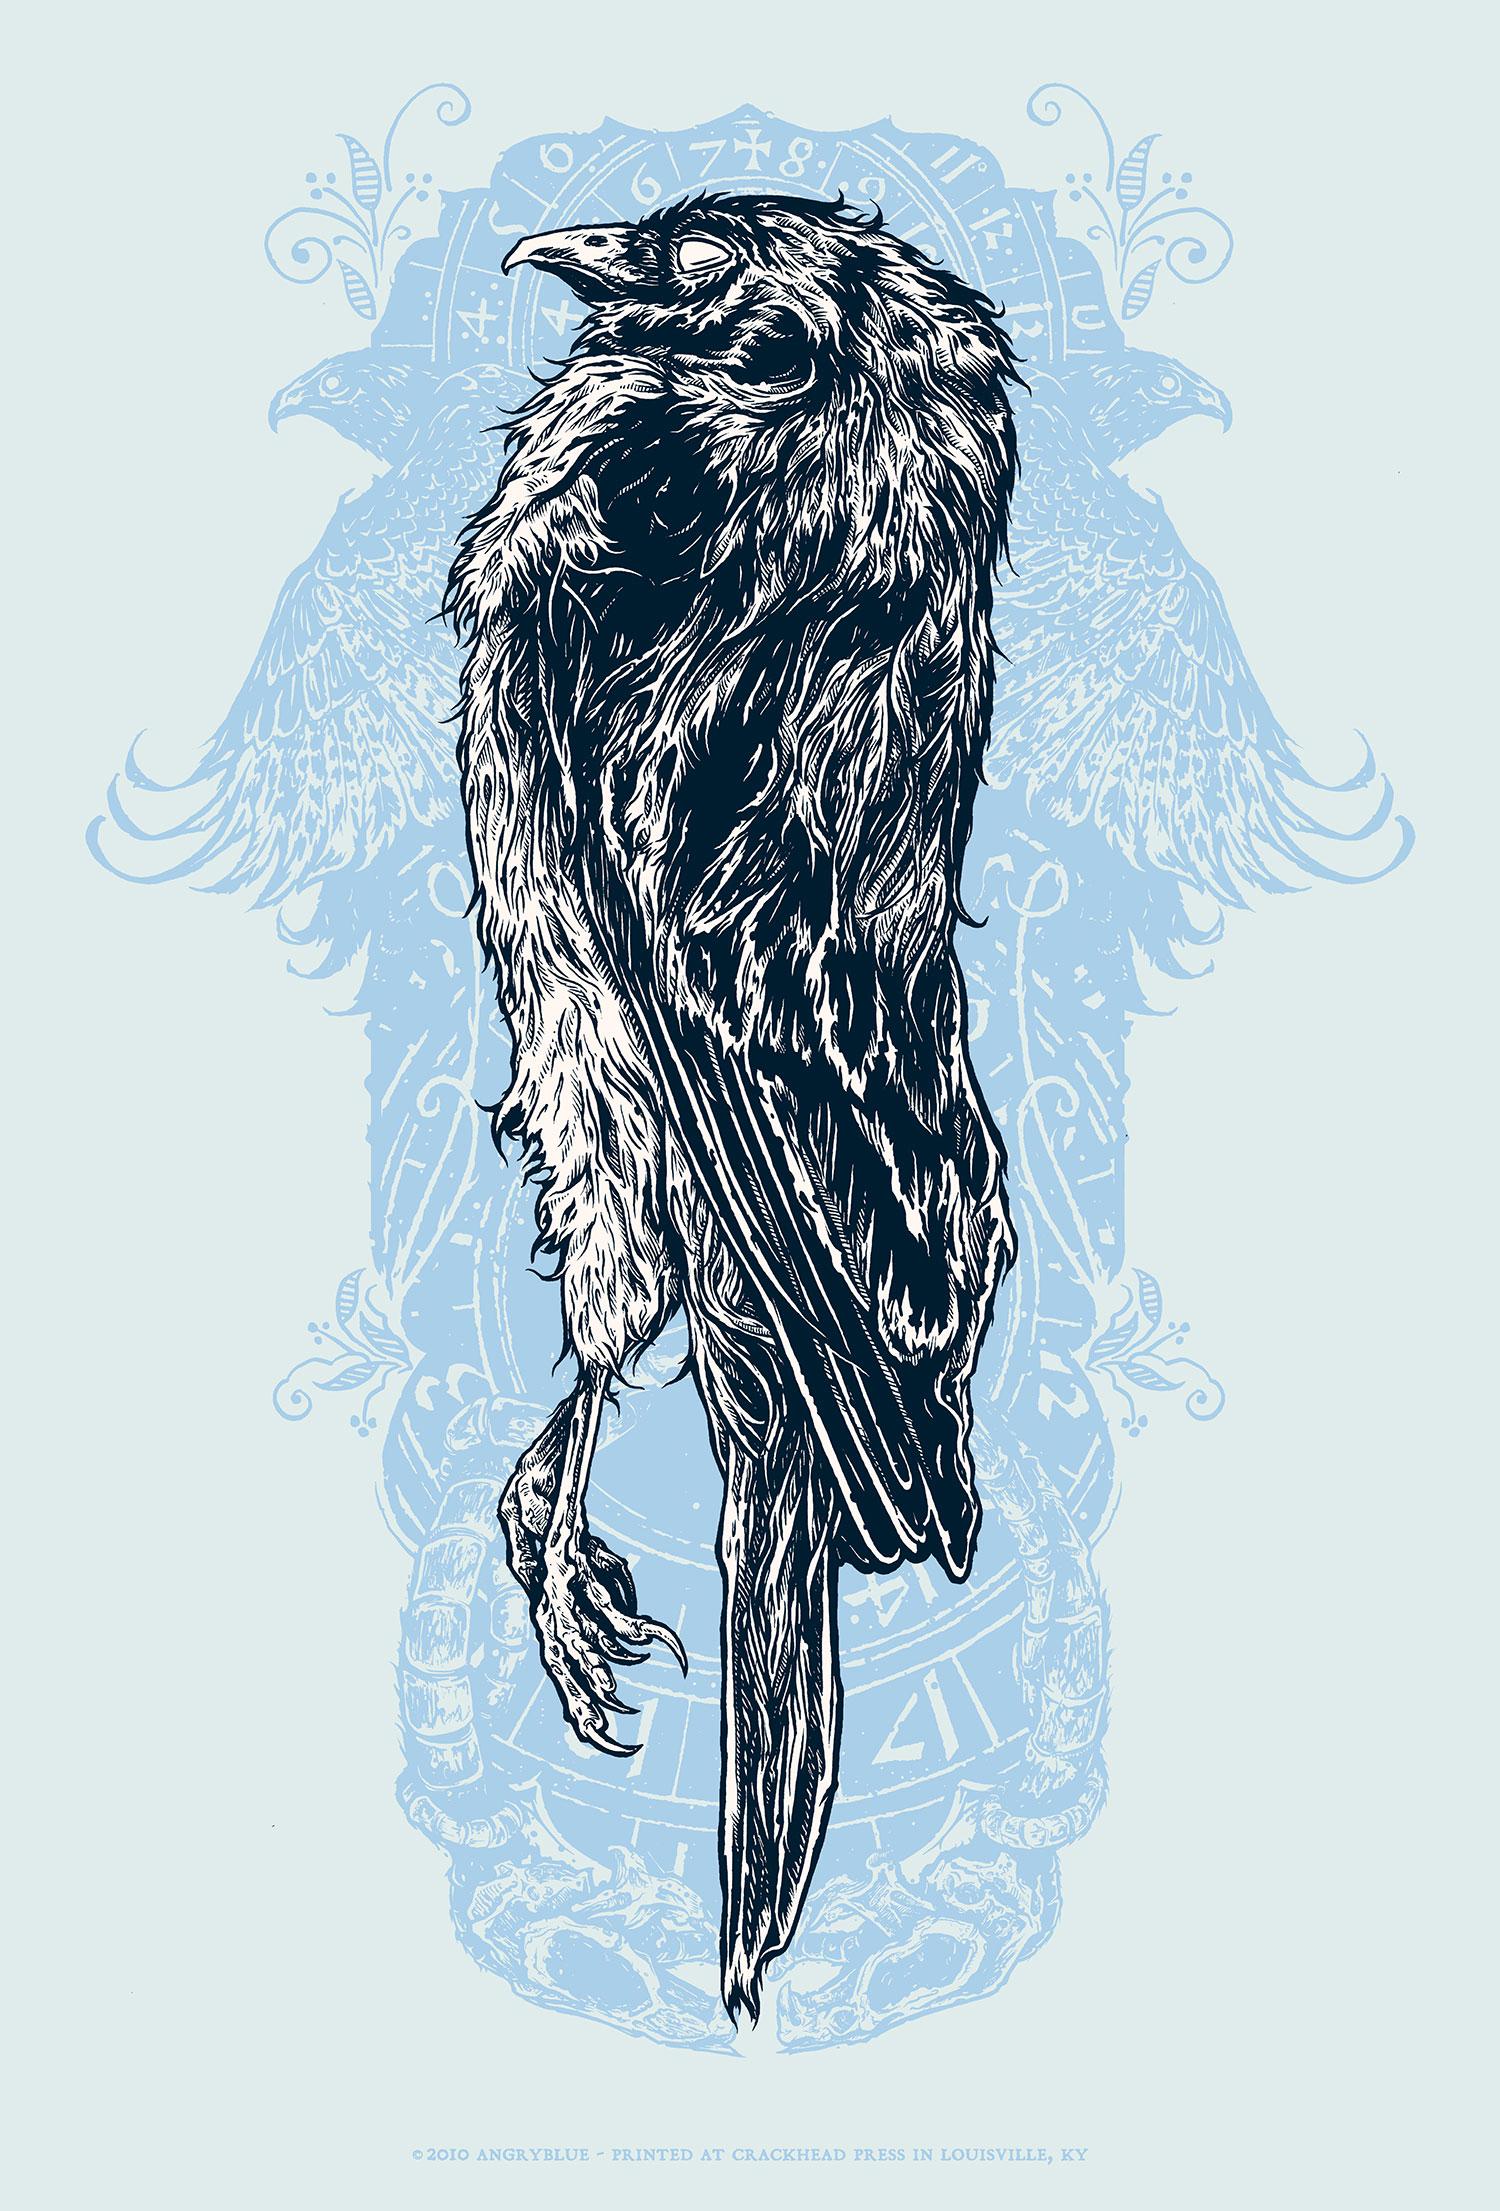 Birdprint_zoop-seps.jpg